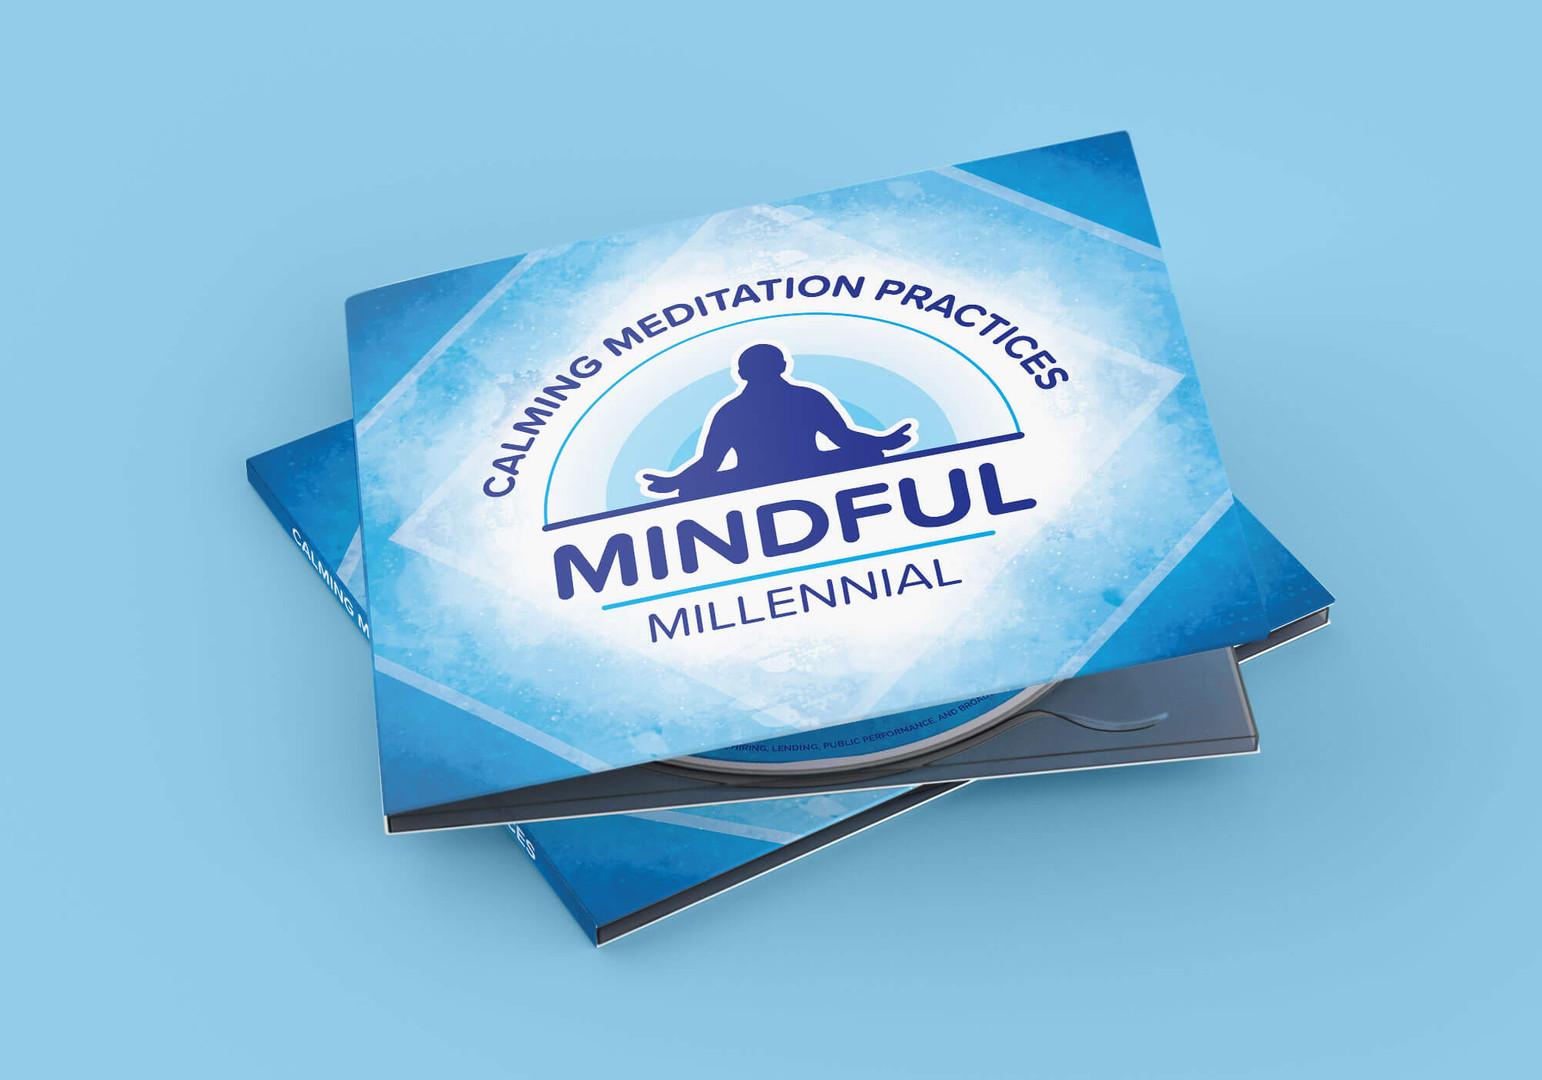 Mindful-Millennial-CD-Cover.jpg